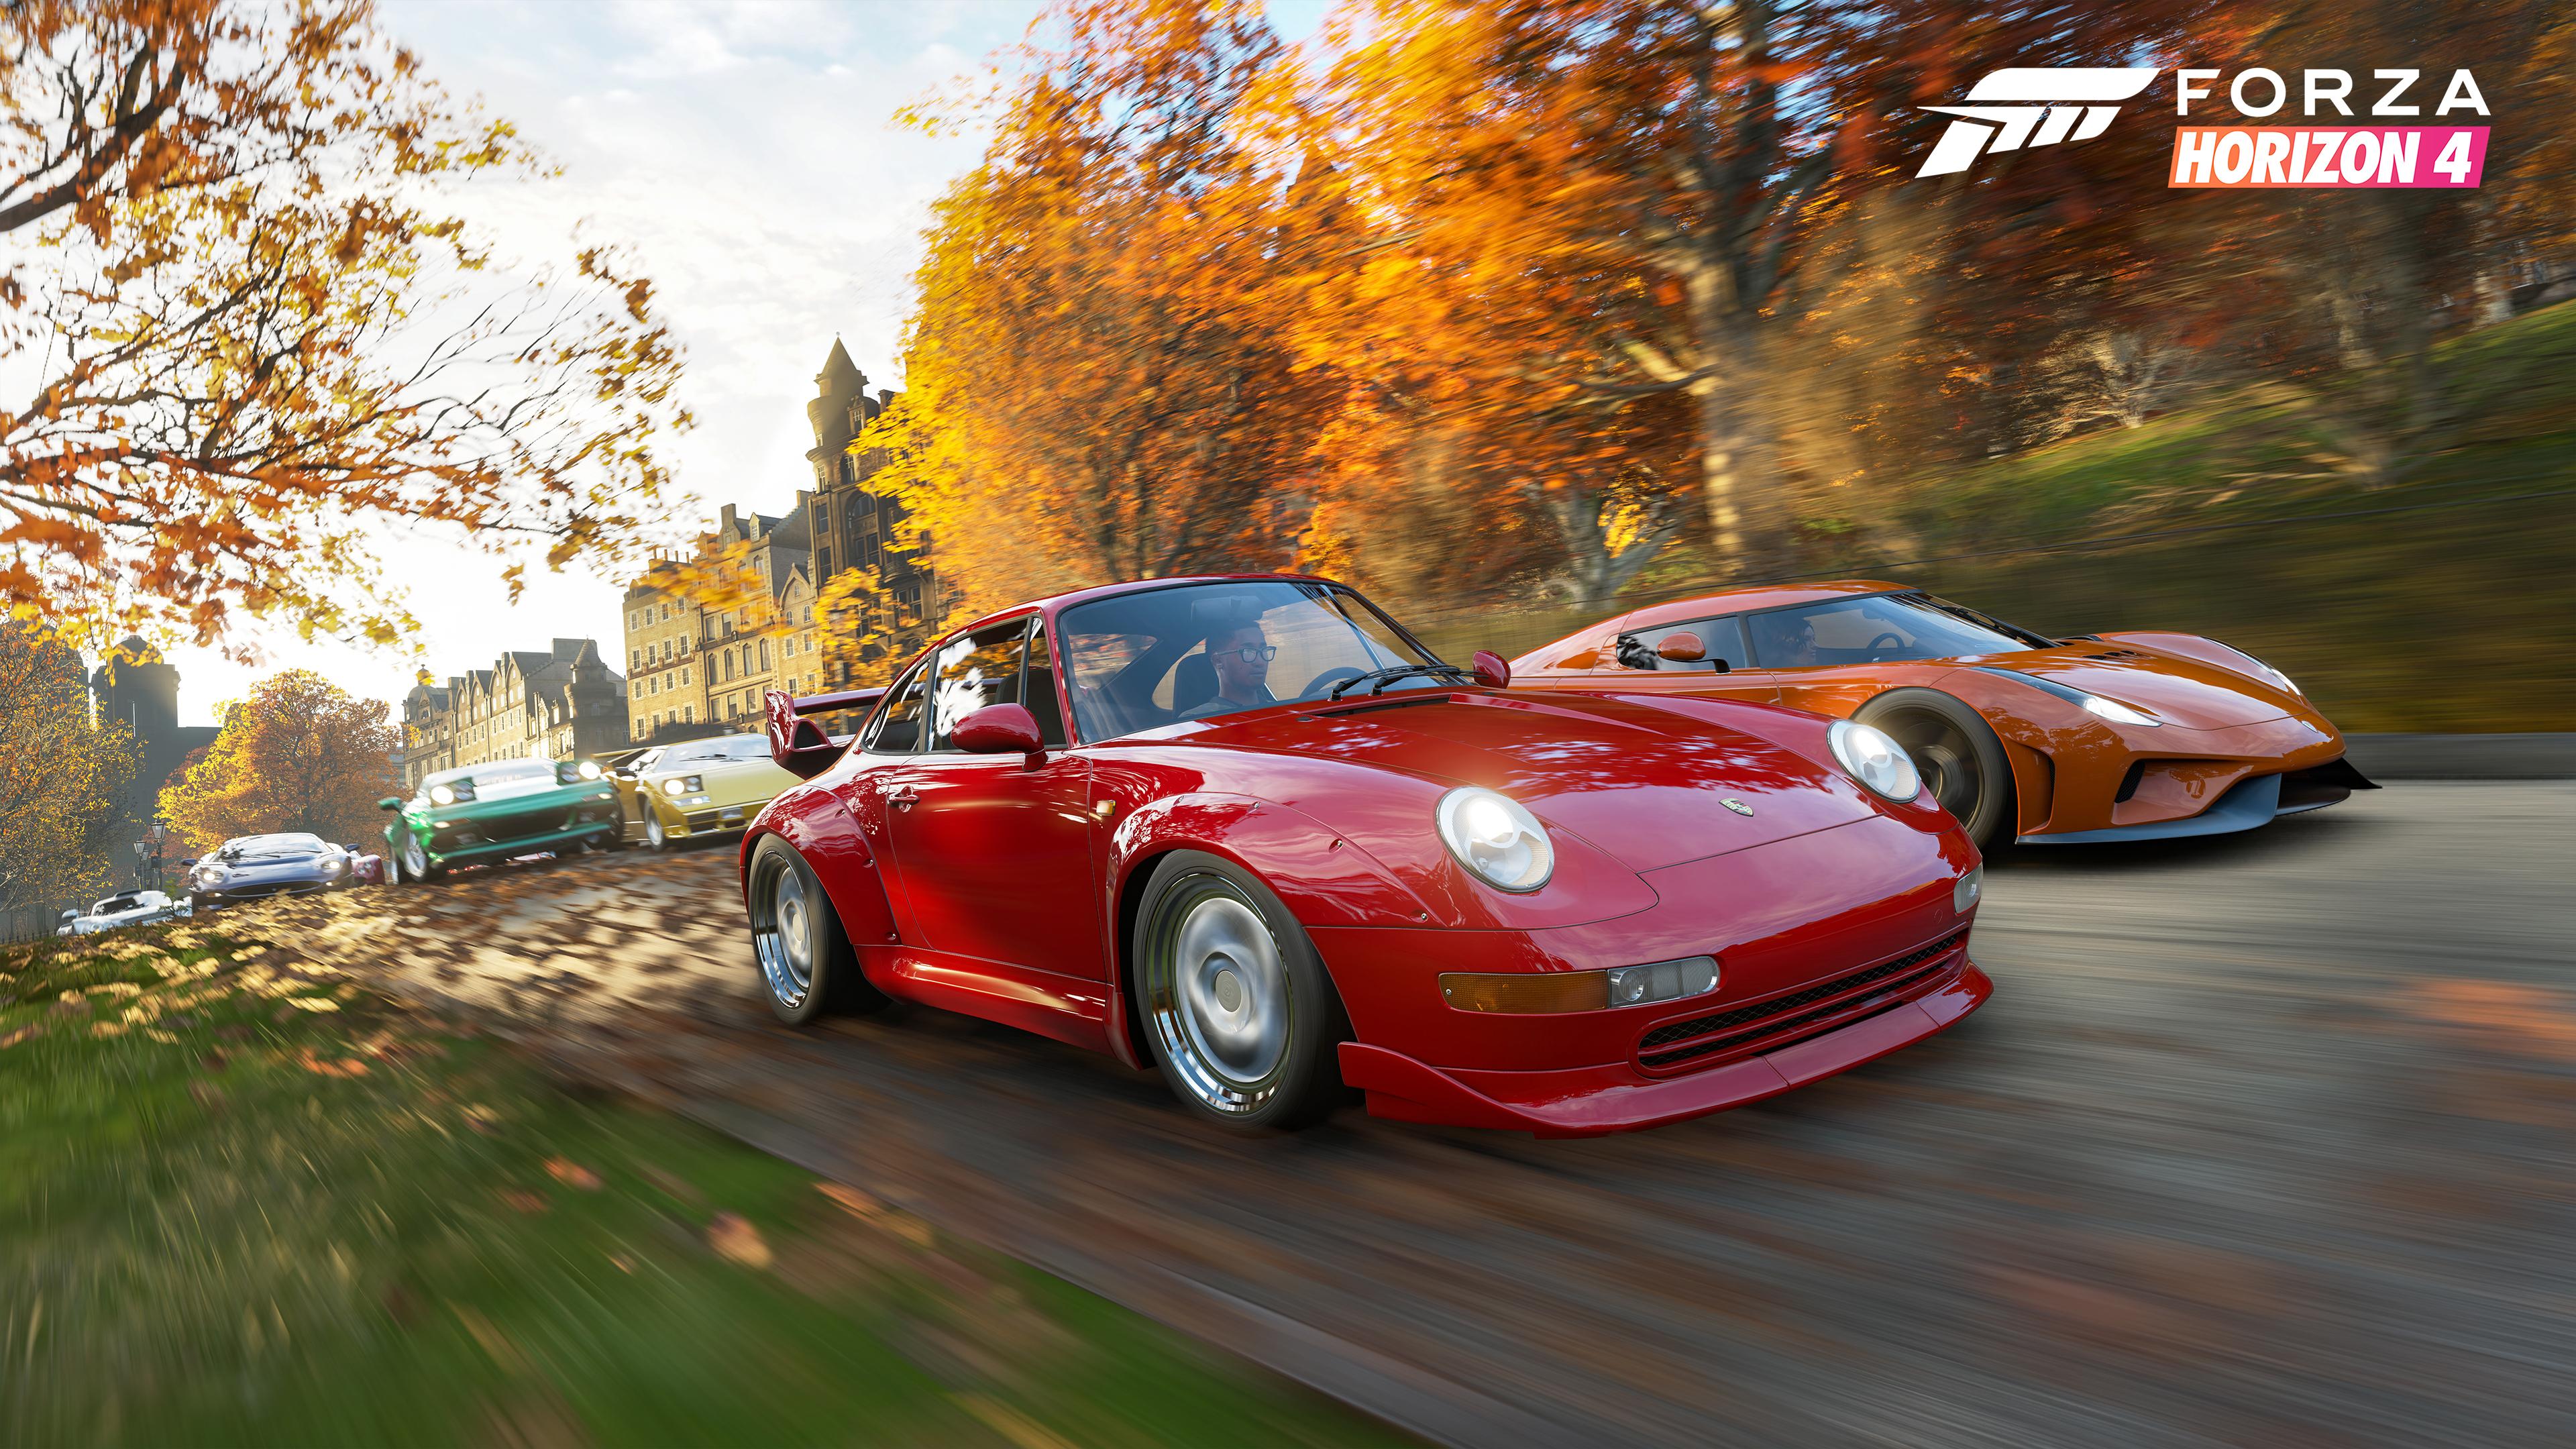 Lista de veículos de Forza Horizon 4 revelada antes do tempo